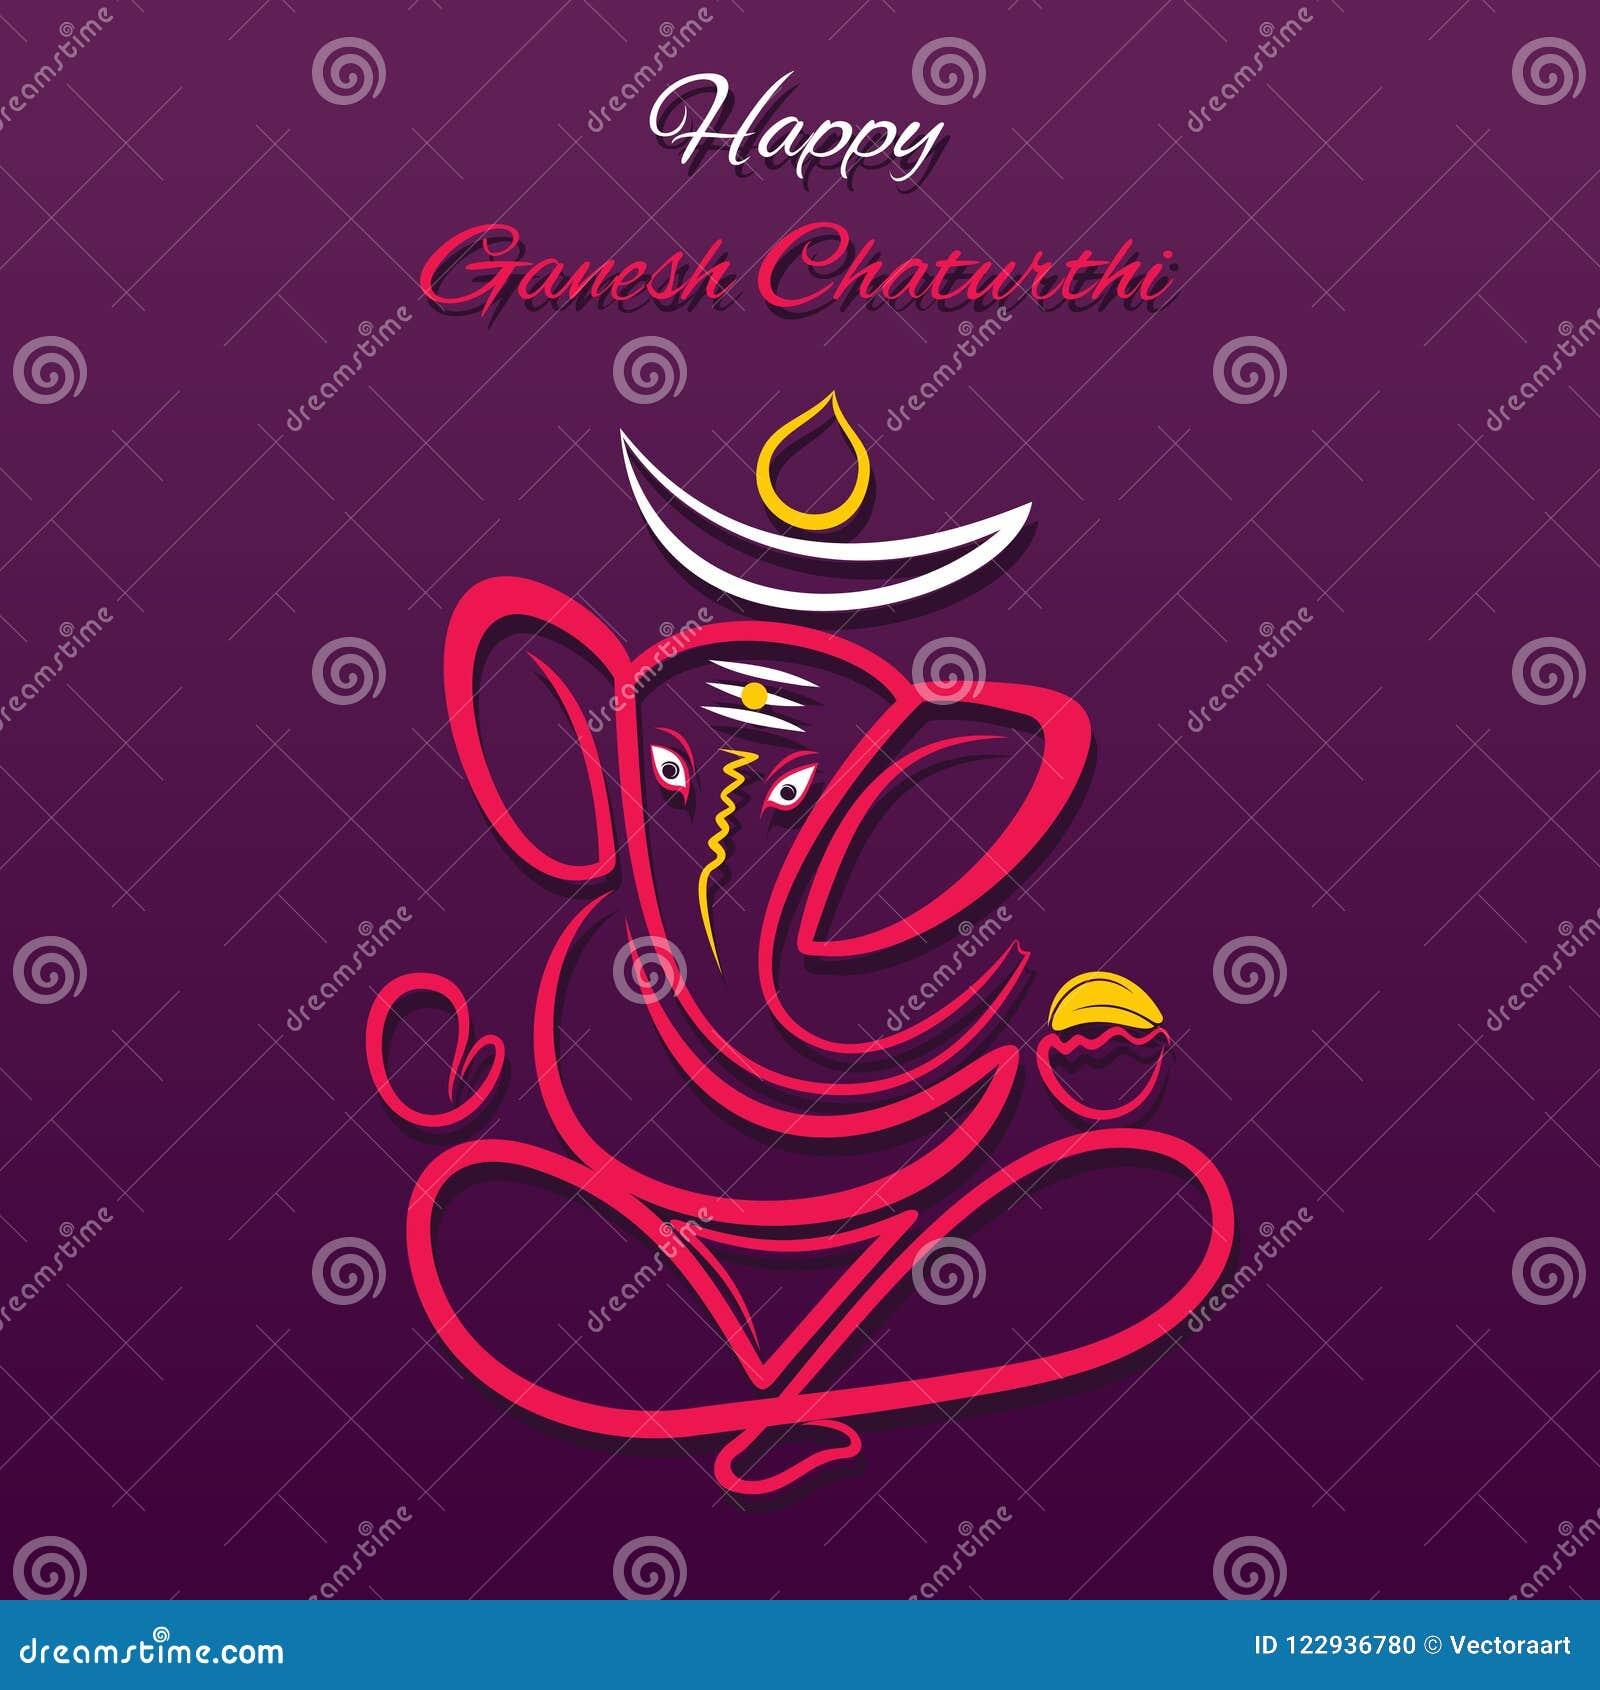 creative poster of celebrate ganesh chaturthi festival stock vector